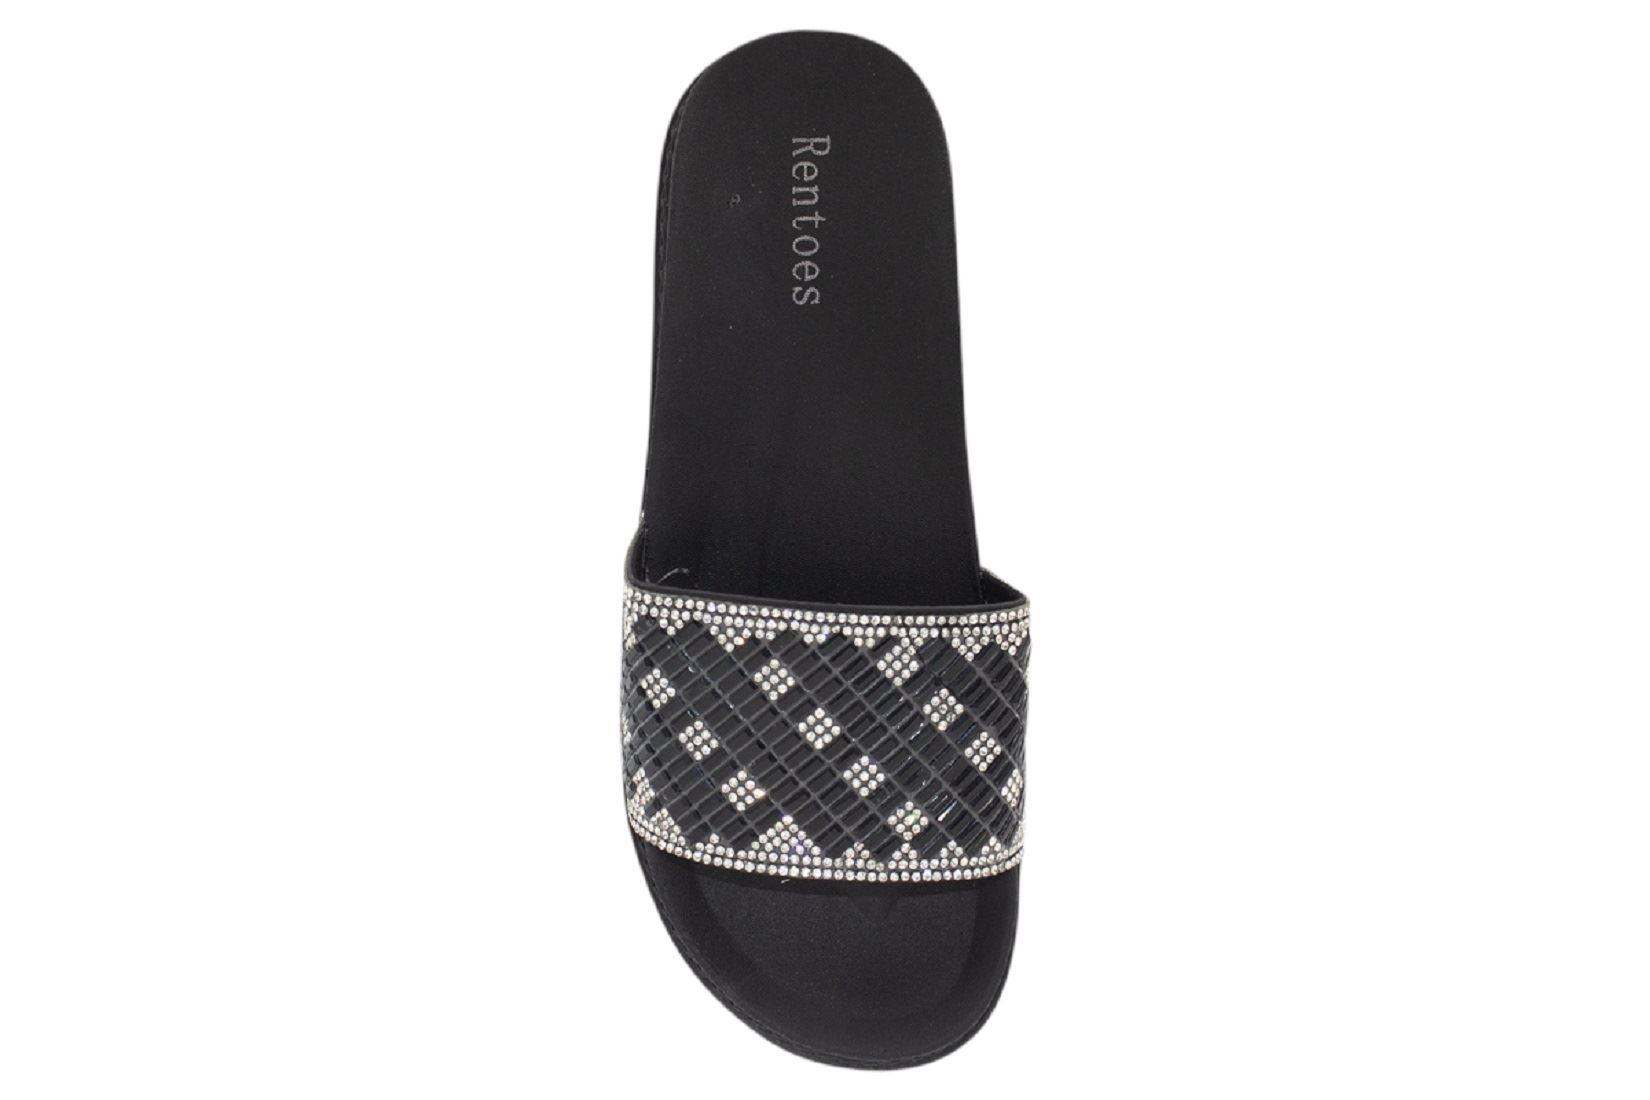 Womens-Sliders-Casual-Slippers-Mules-Ladies-Diamante-Flip-Flop-Sandals-Shoes thumbnail 13